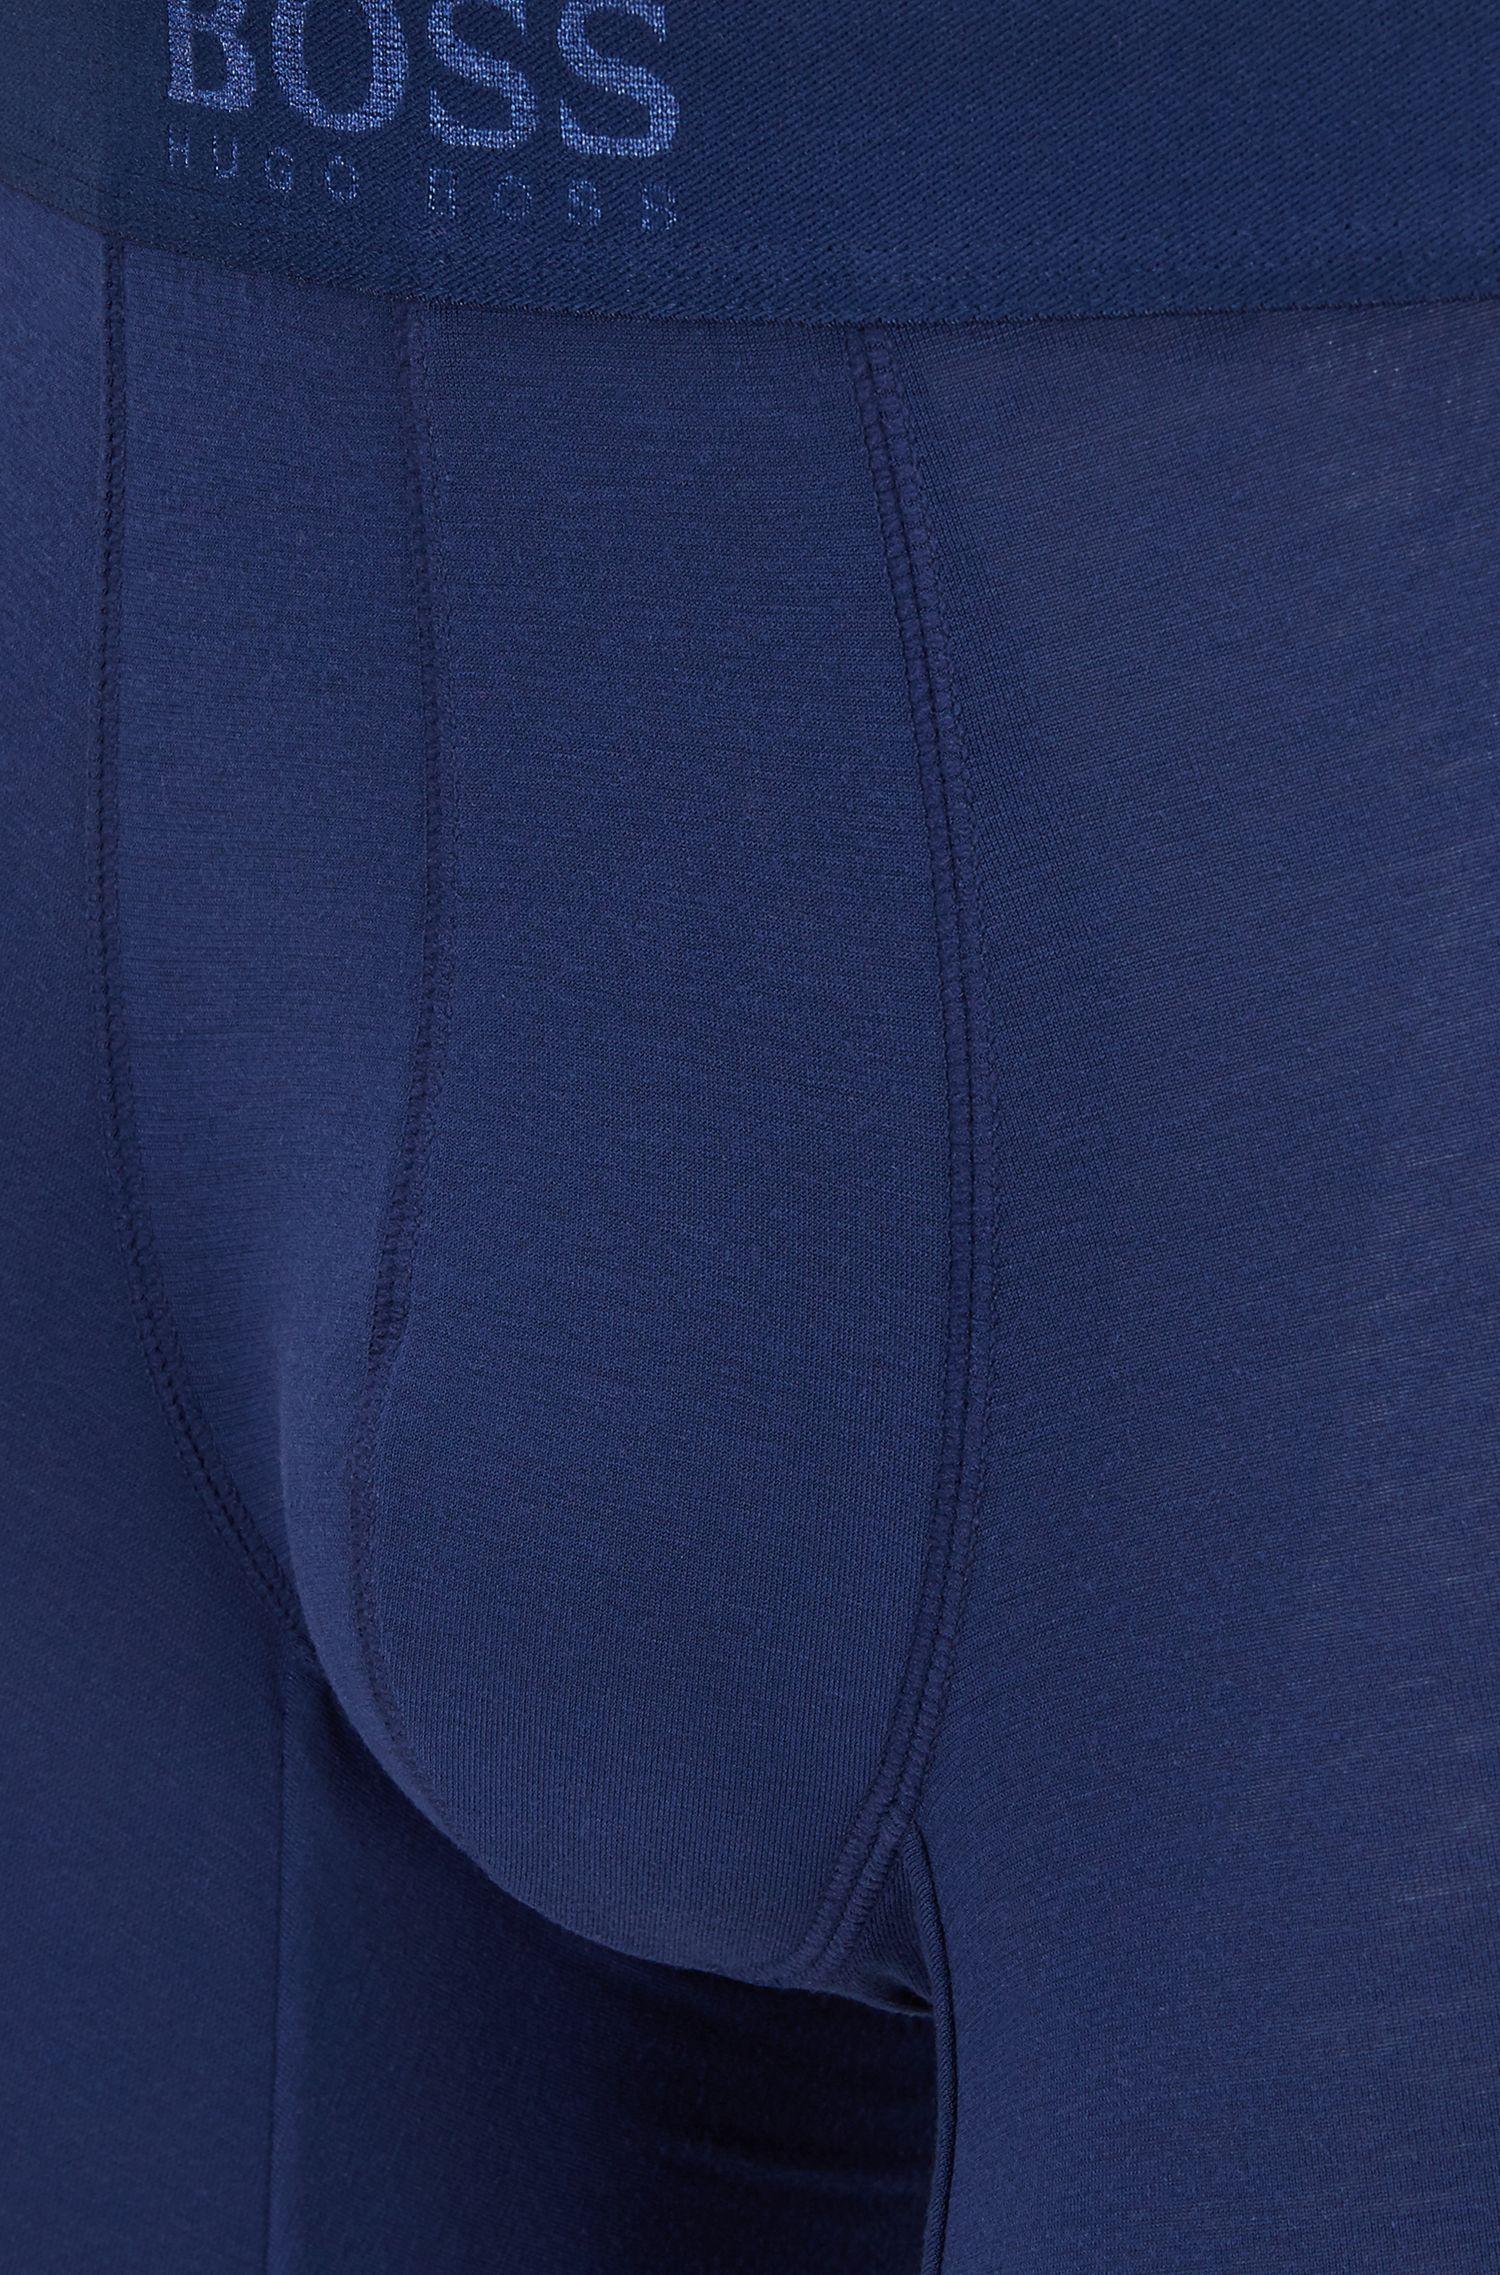 Stretch Modal Boxer Brief | Boxer Brief Modal, Blue